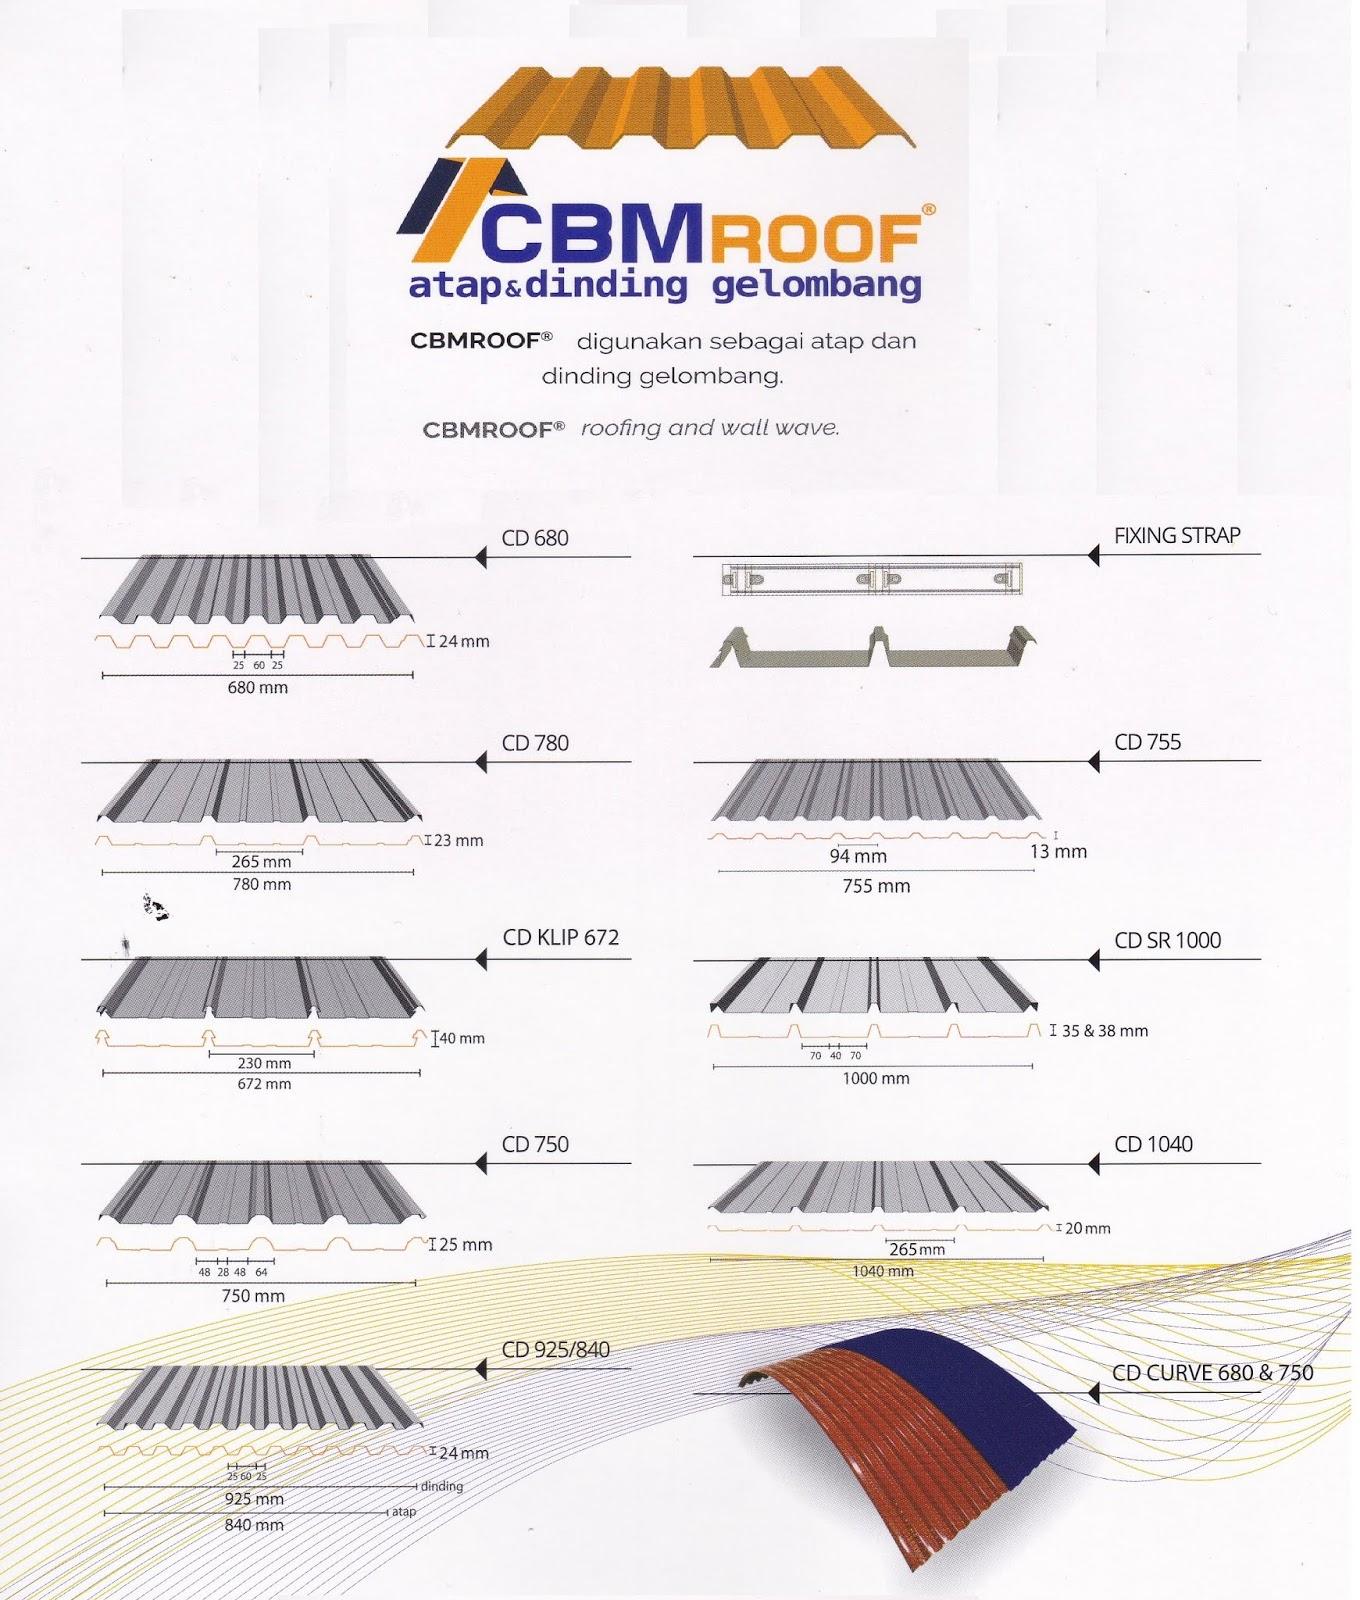 Harga Atap Baja Ringan Zinc Galvalume Zincalume 2019 Supplier Bangunan